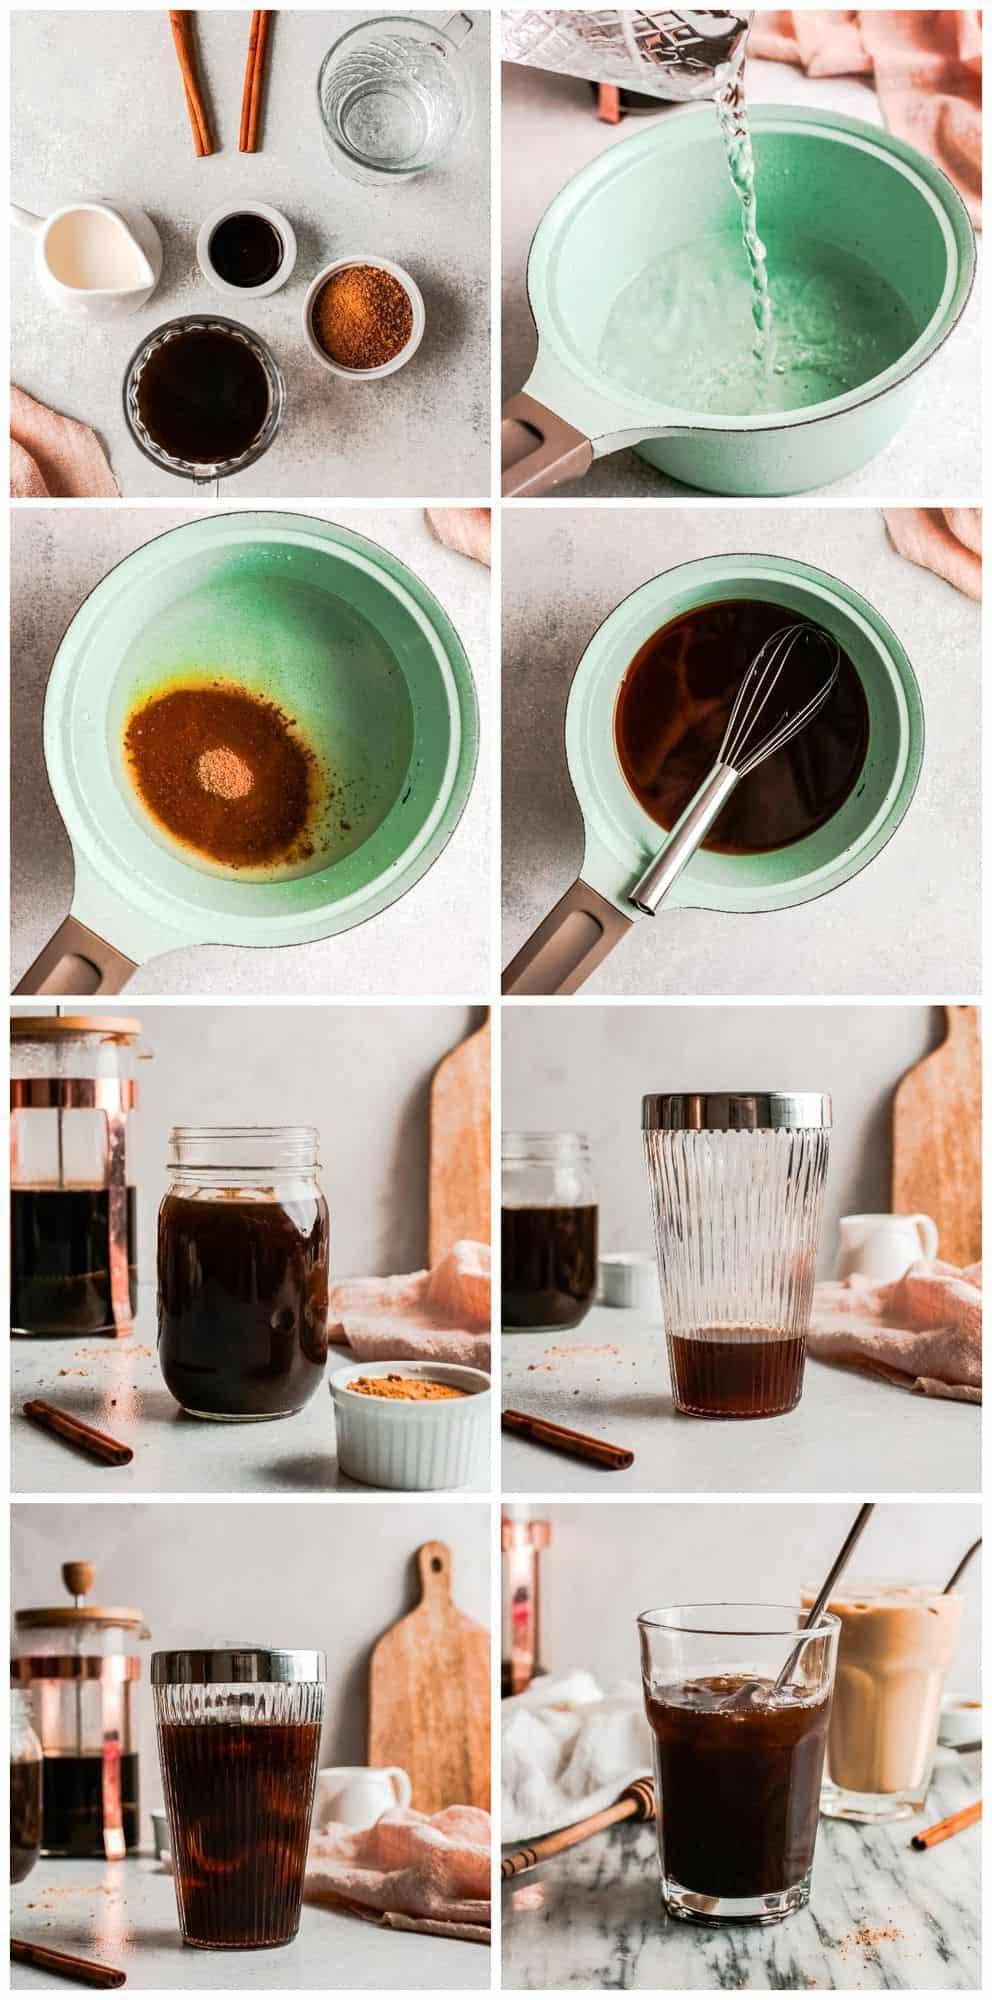 step by step photos for how to make iced espresso